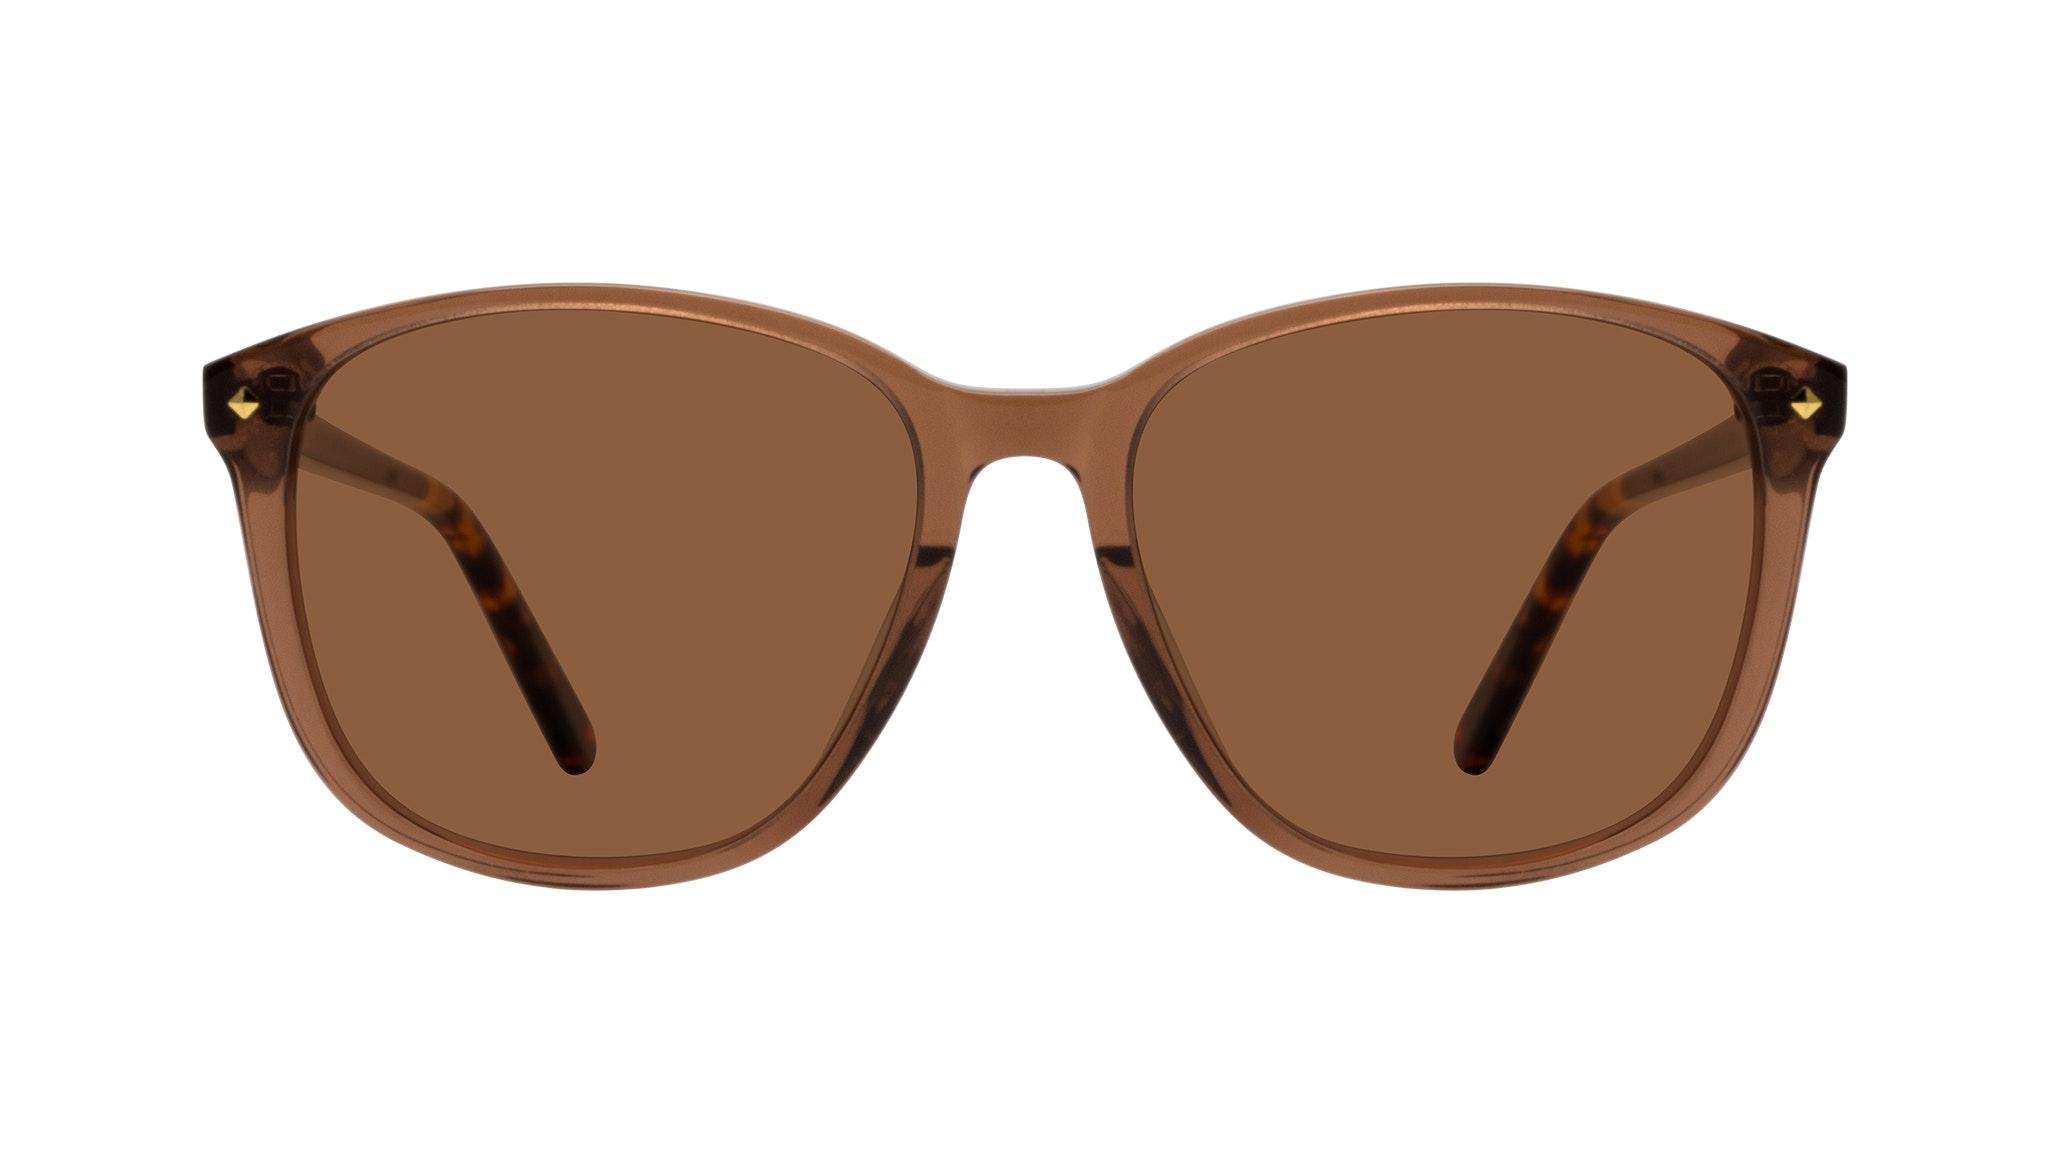 Affordable Fashion Glasses Square Sunglasses Women Lauren Terra